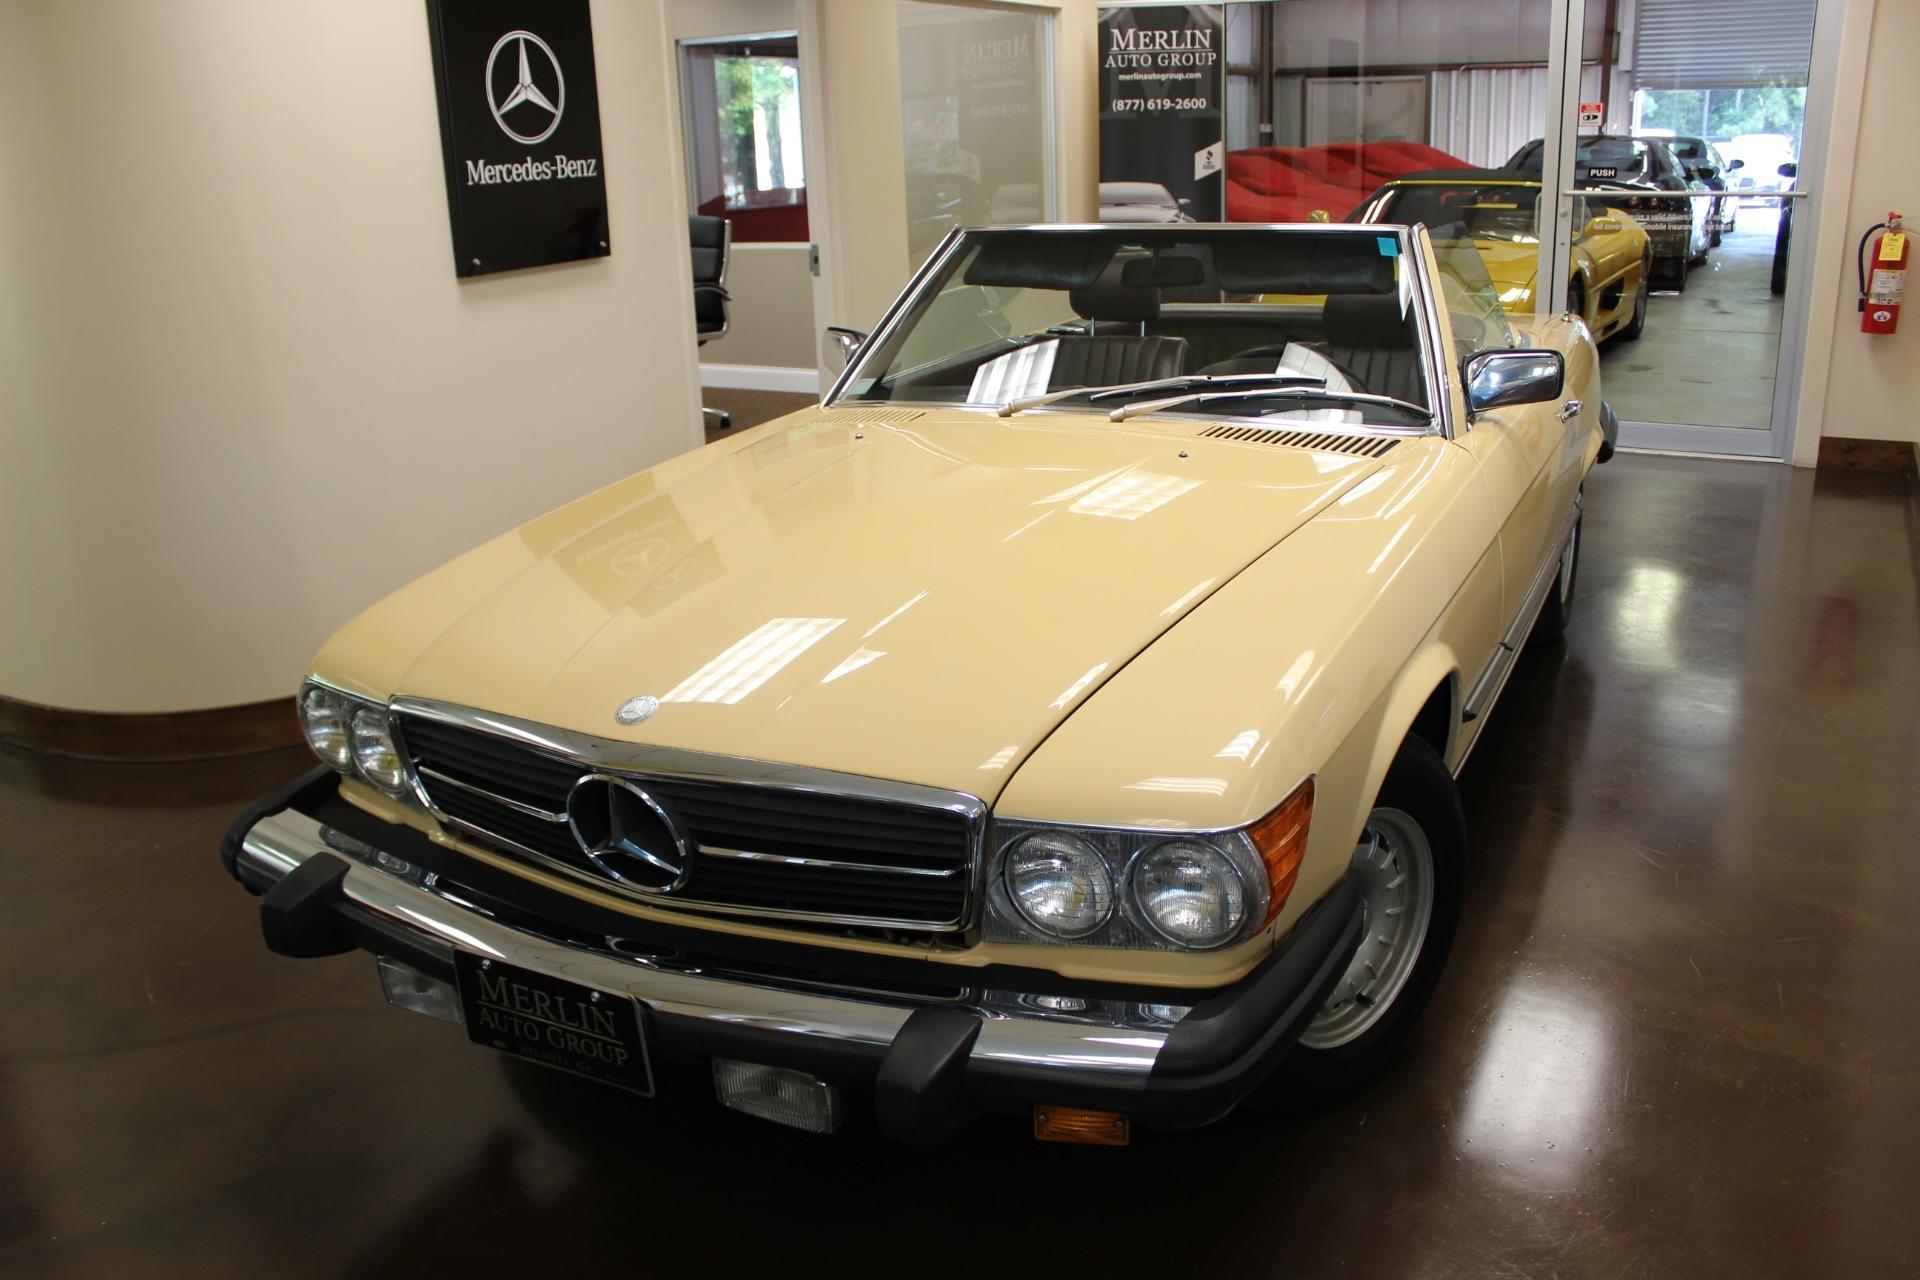 Used 1983 mercedes benz 380 manila beige convertible v8 3 for Used mercedes benz convertible cars for sale